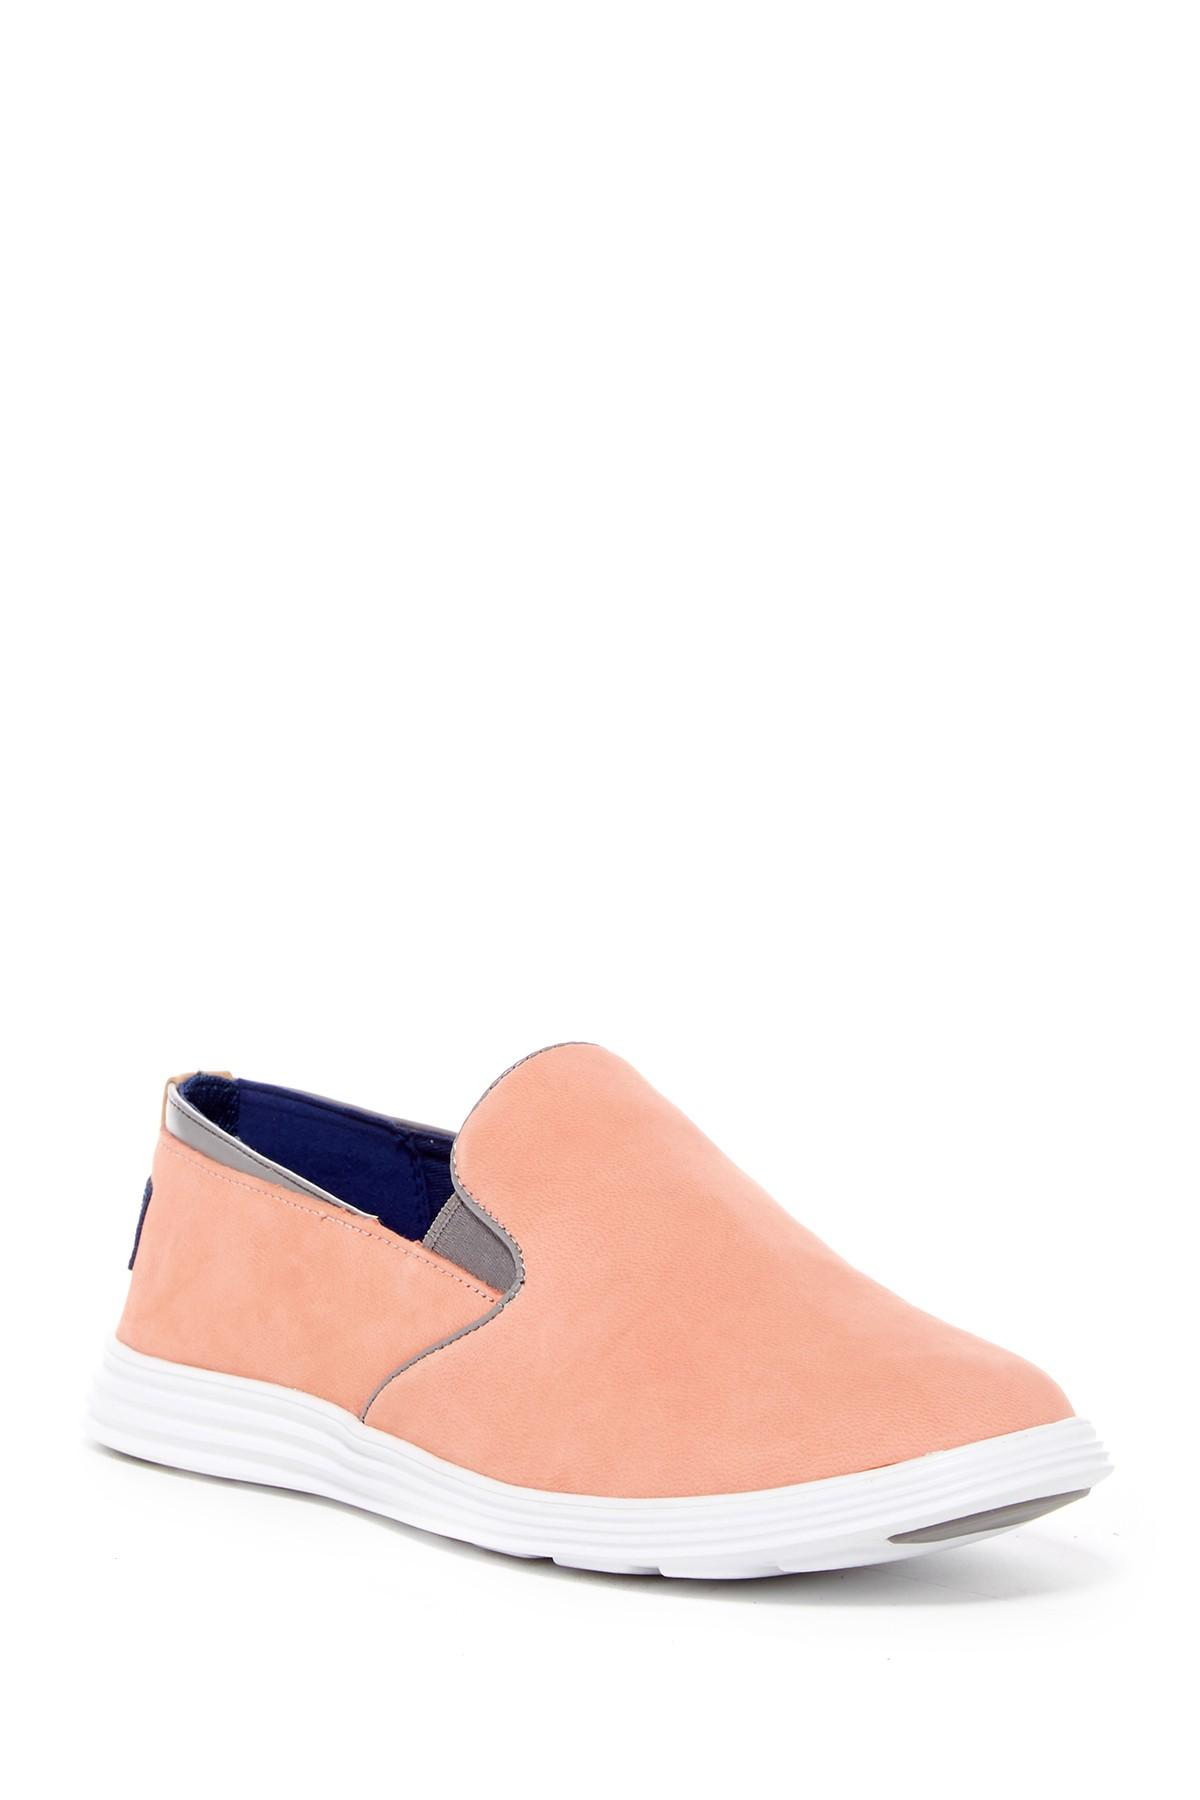 Cole Haan Ella Grand 2gore Slip On Sneaker Wide Width